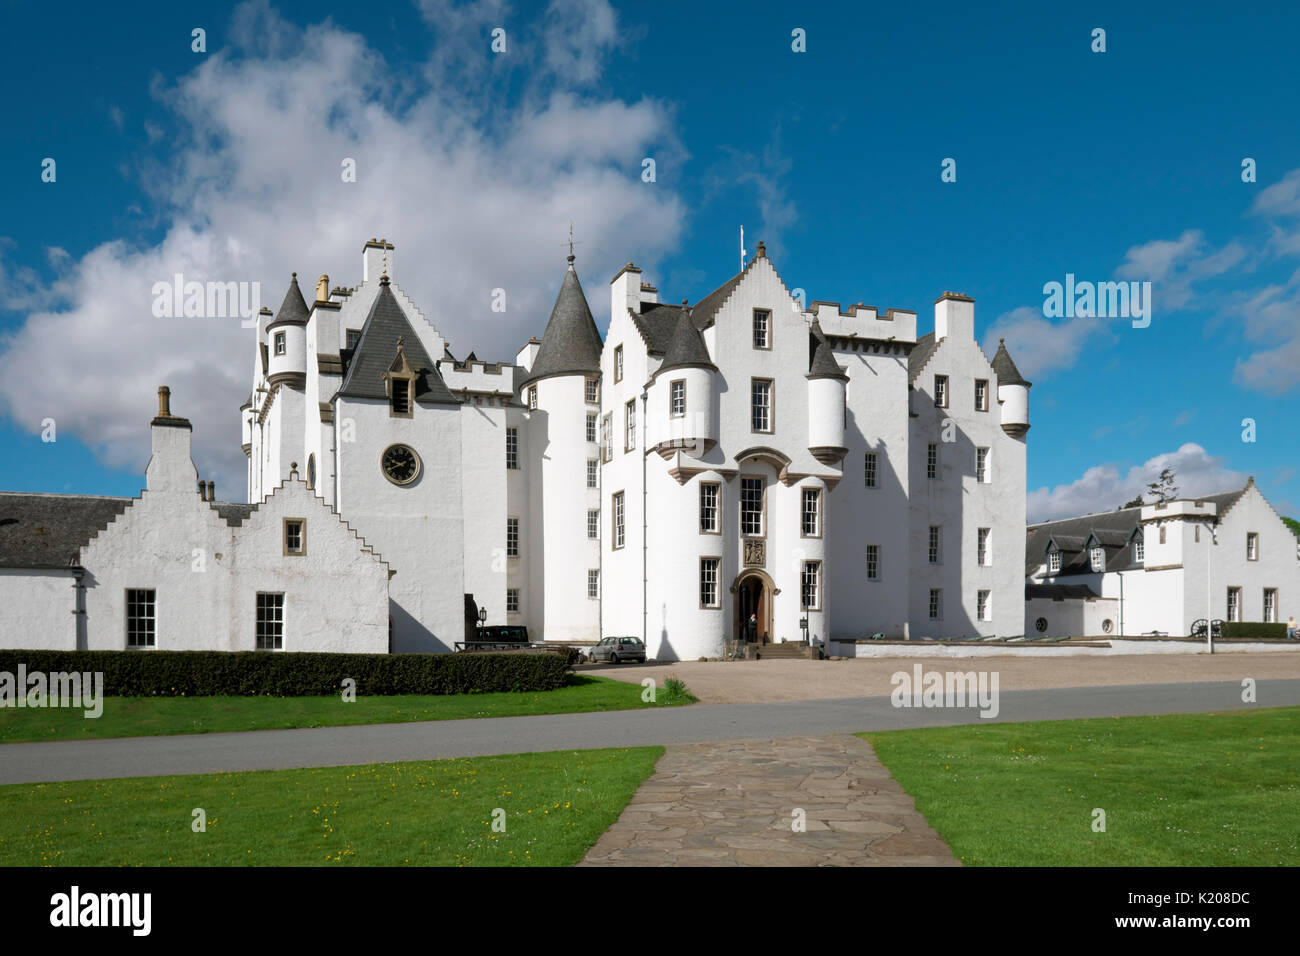 Blair Castle, Blair Atholl, Perth and Kinross, Scotland, United Kingdom - Stock Image